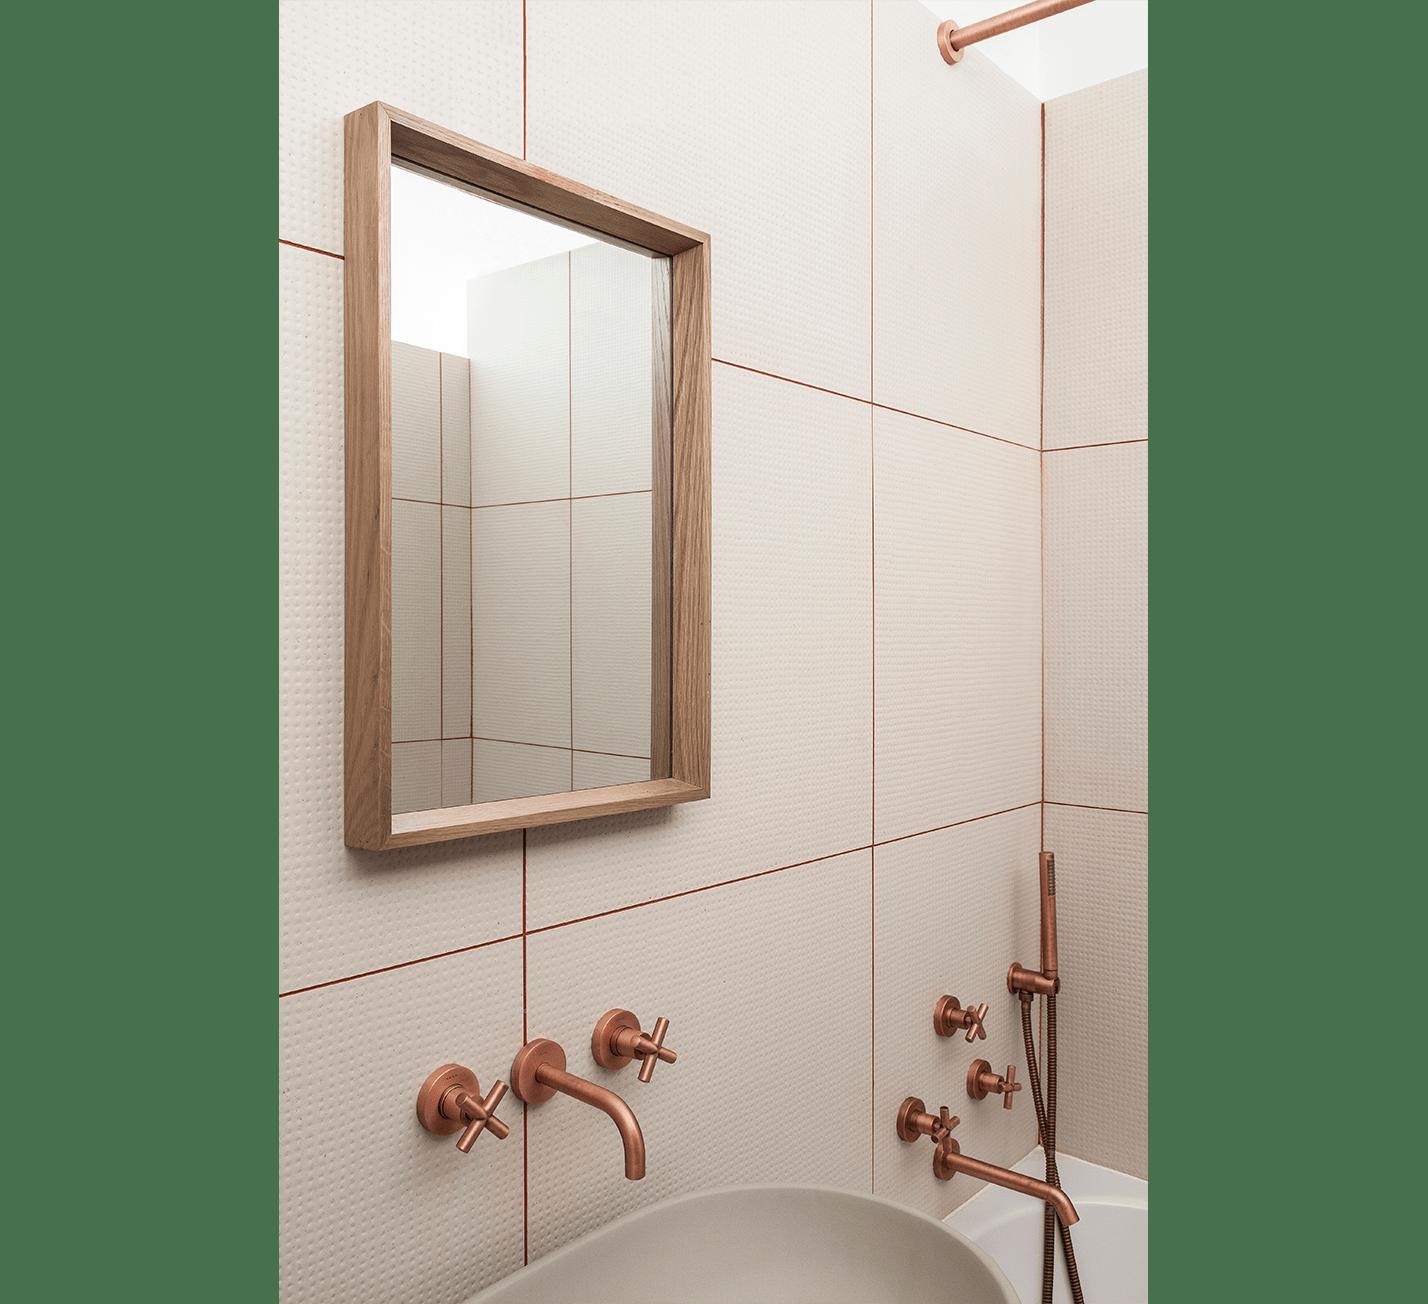 Projet-Alfred-Atelier-Steve-Pauline-Borgia-Architecture-interieur-09-min